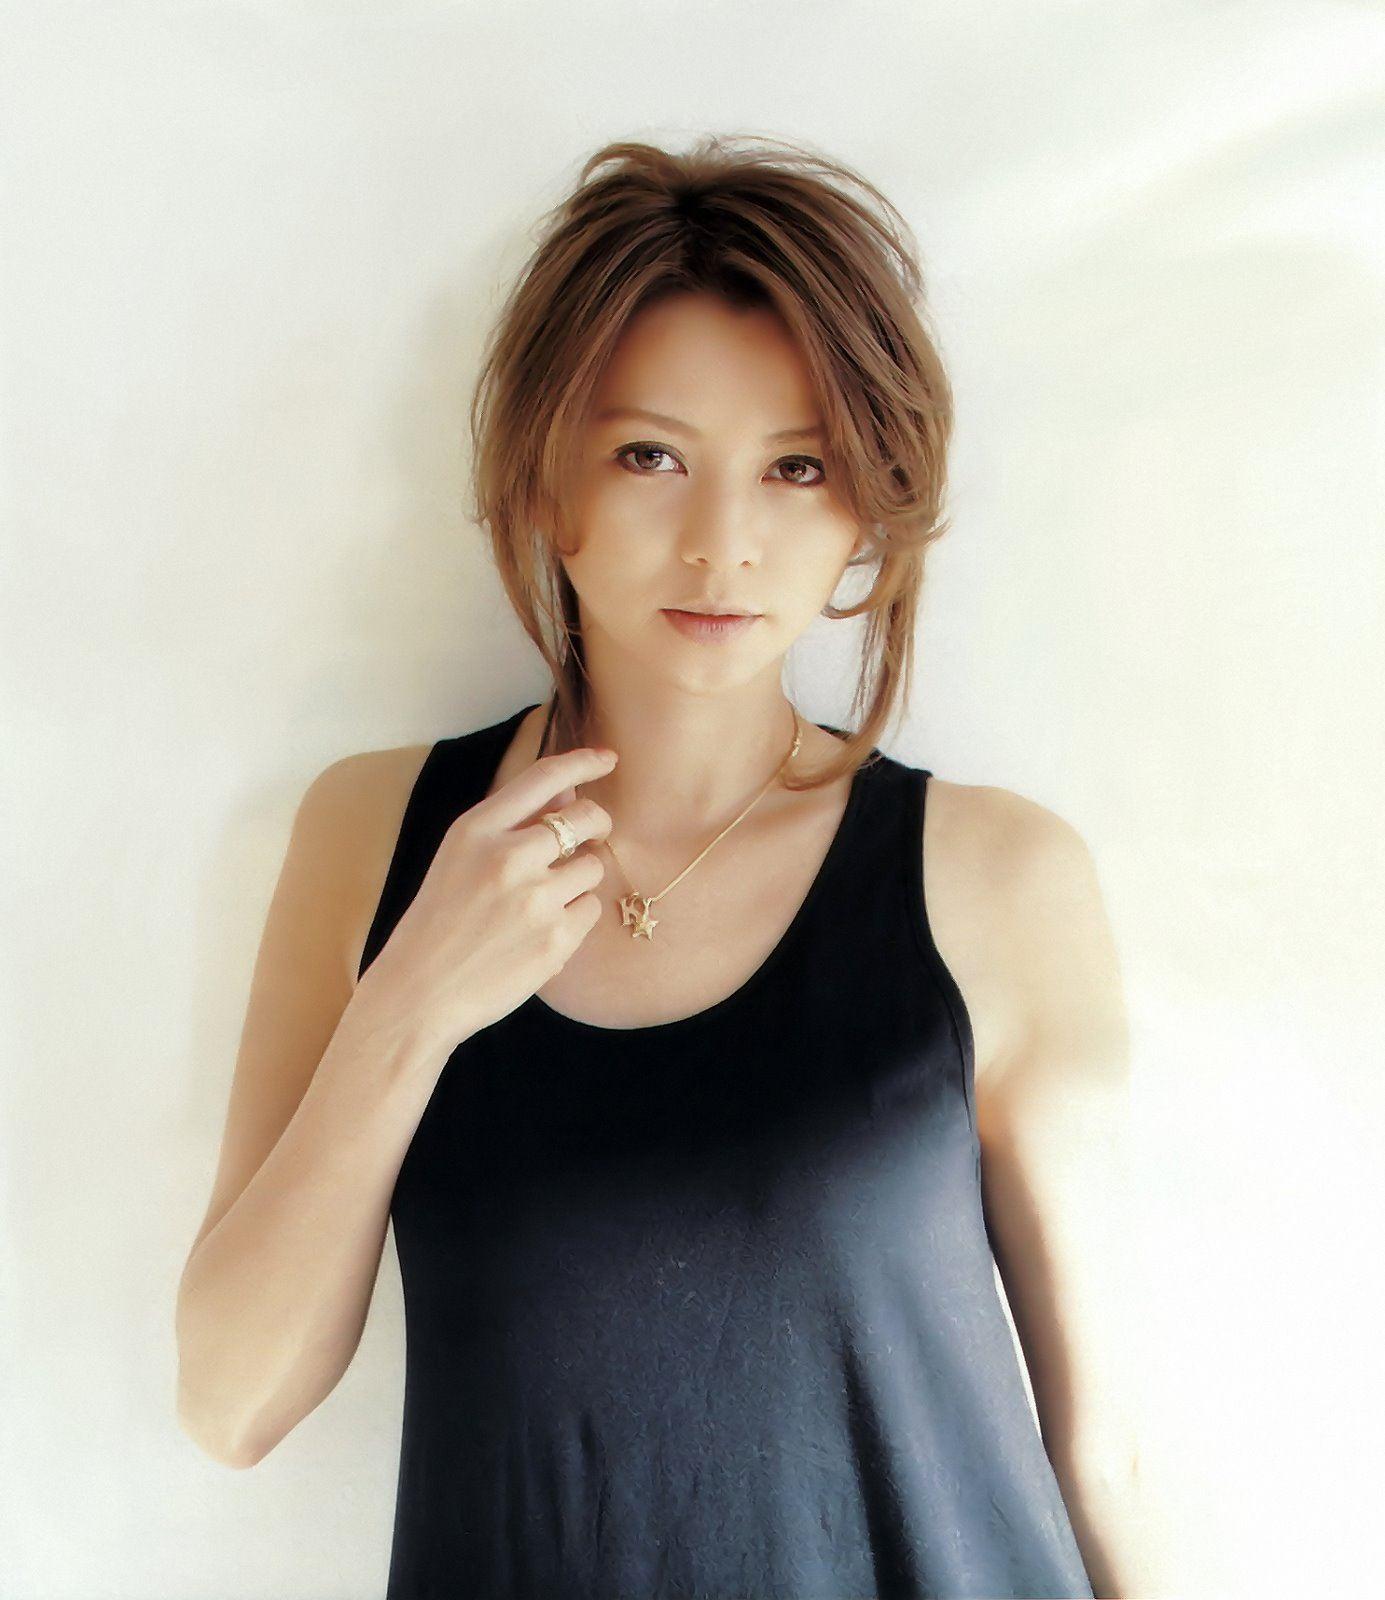 http://japanese-sirens.com/wp-content/uploads/2015/03/karina-nose-13.jpg